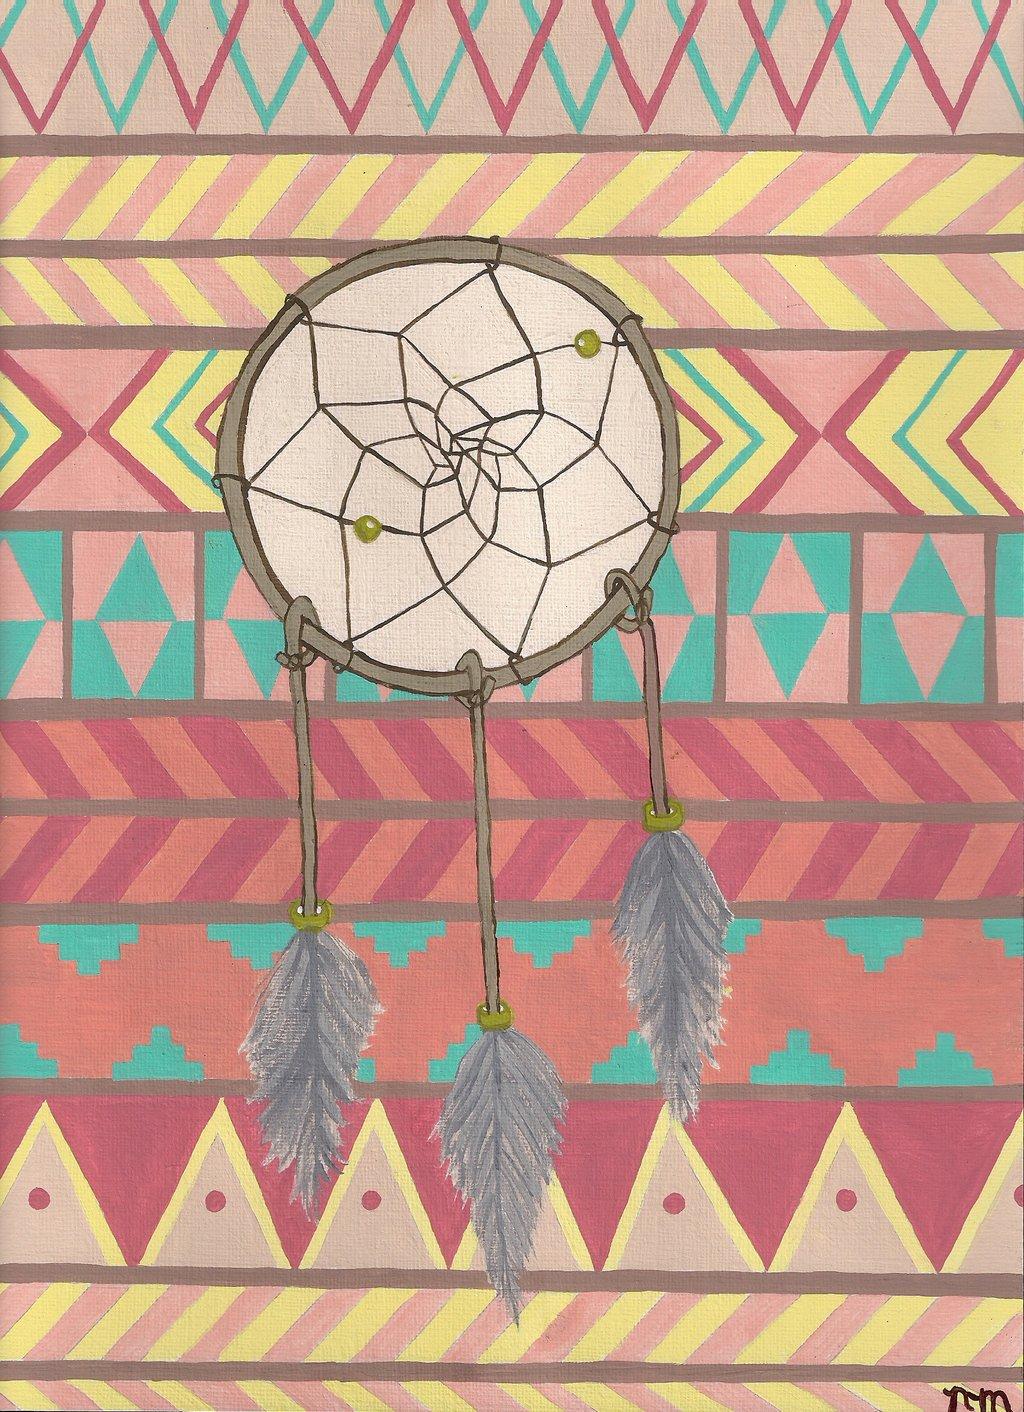 Dream catcher wallpaper impremedia go back images for cute dreamcatcher wallpaper voltagebd Gallery